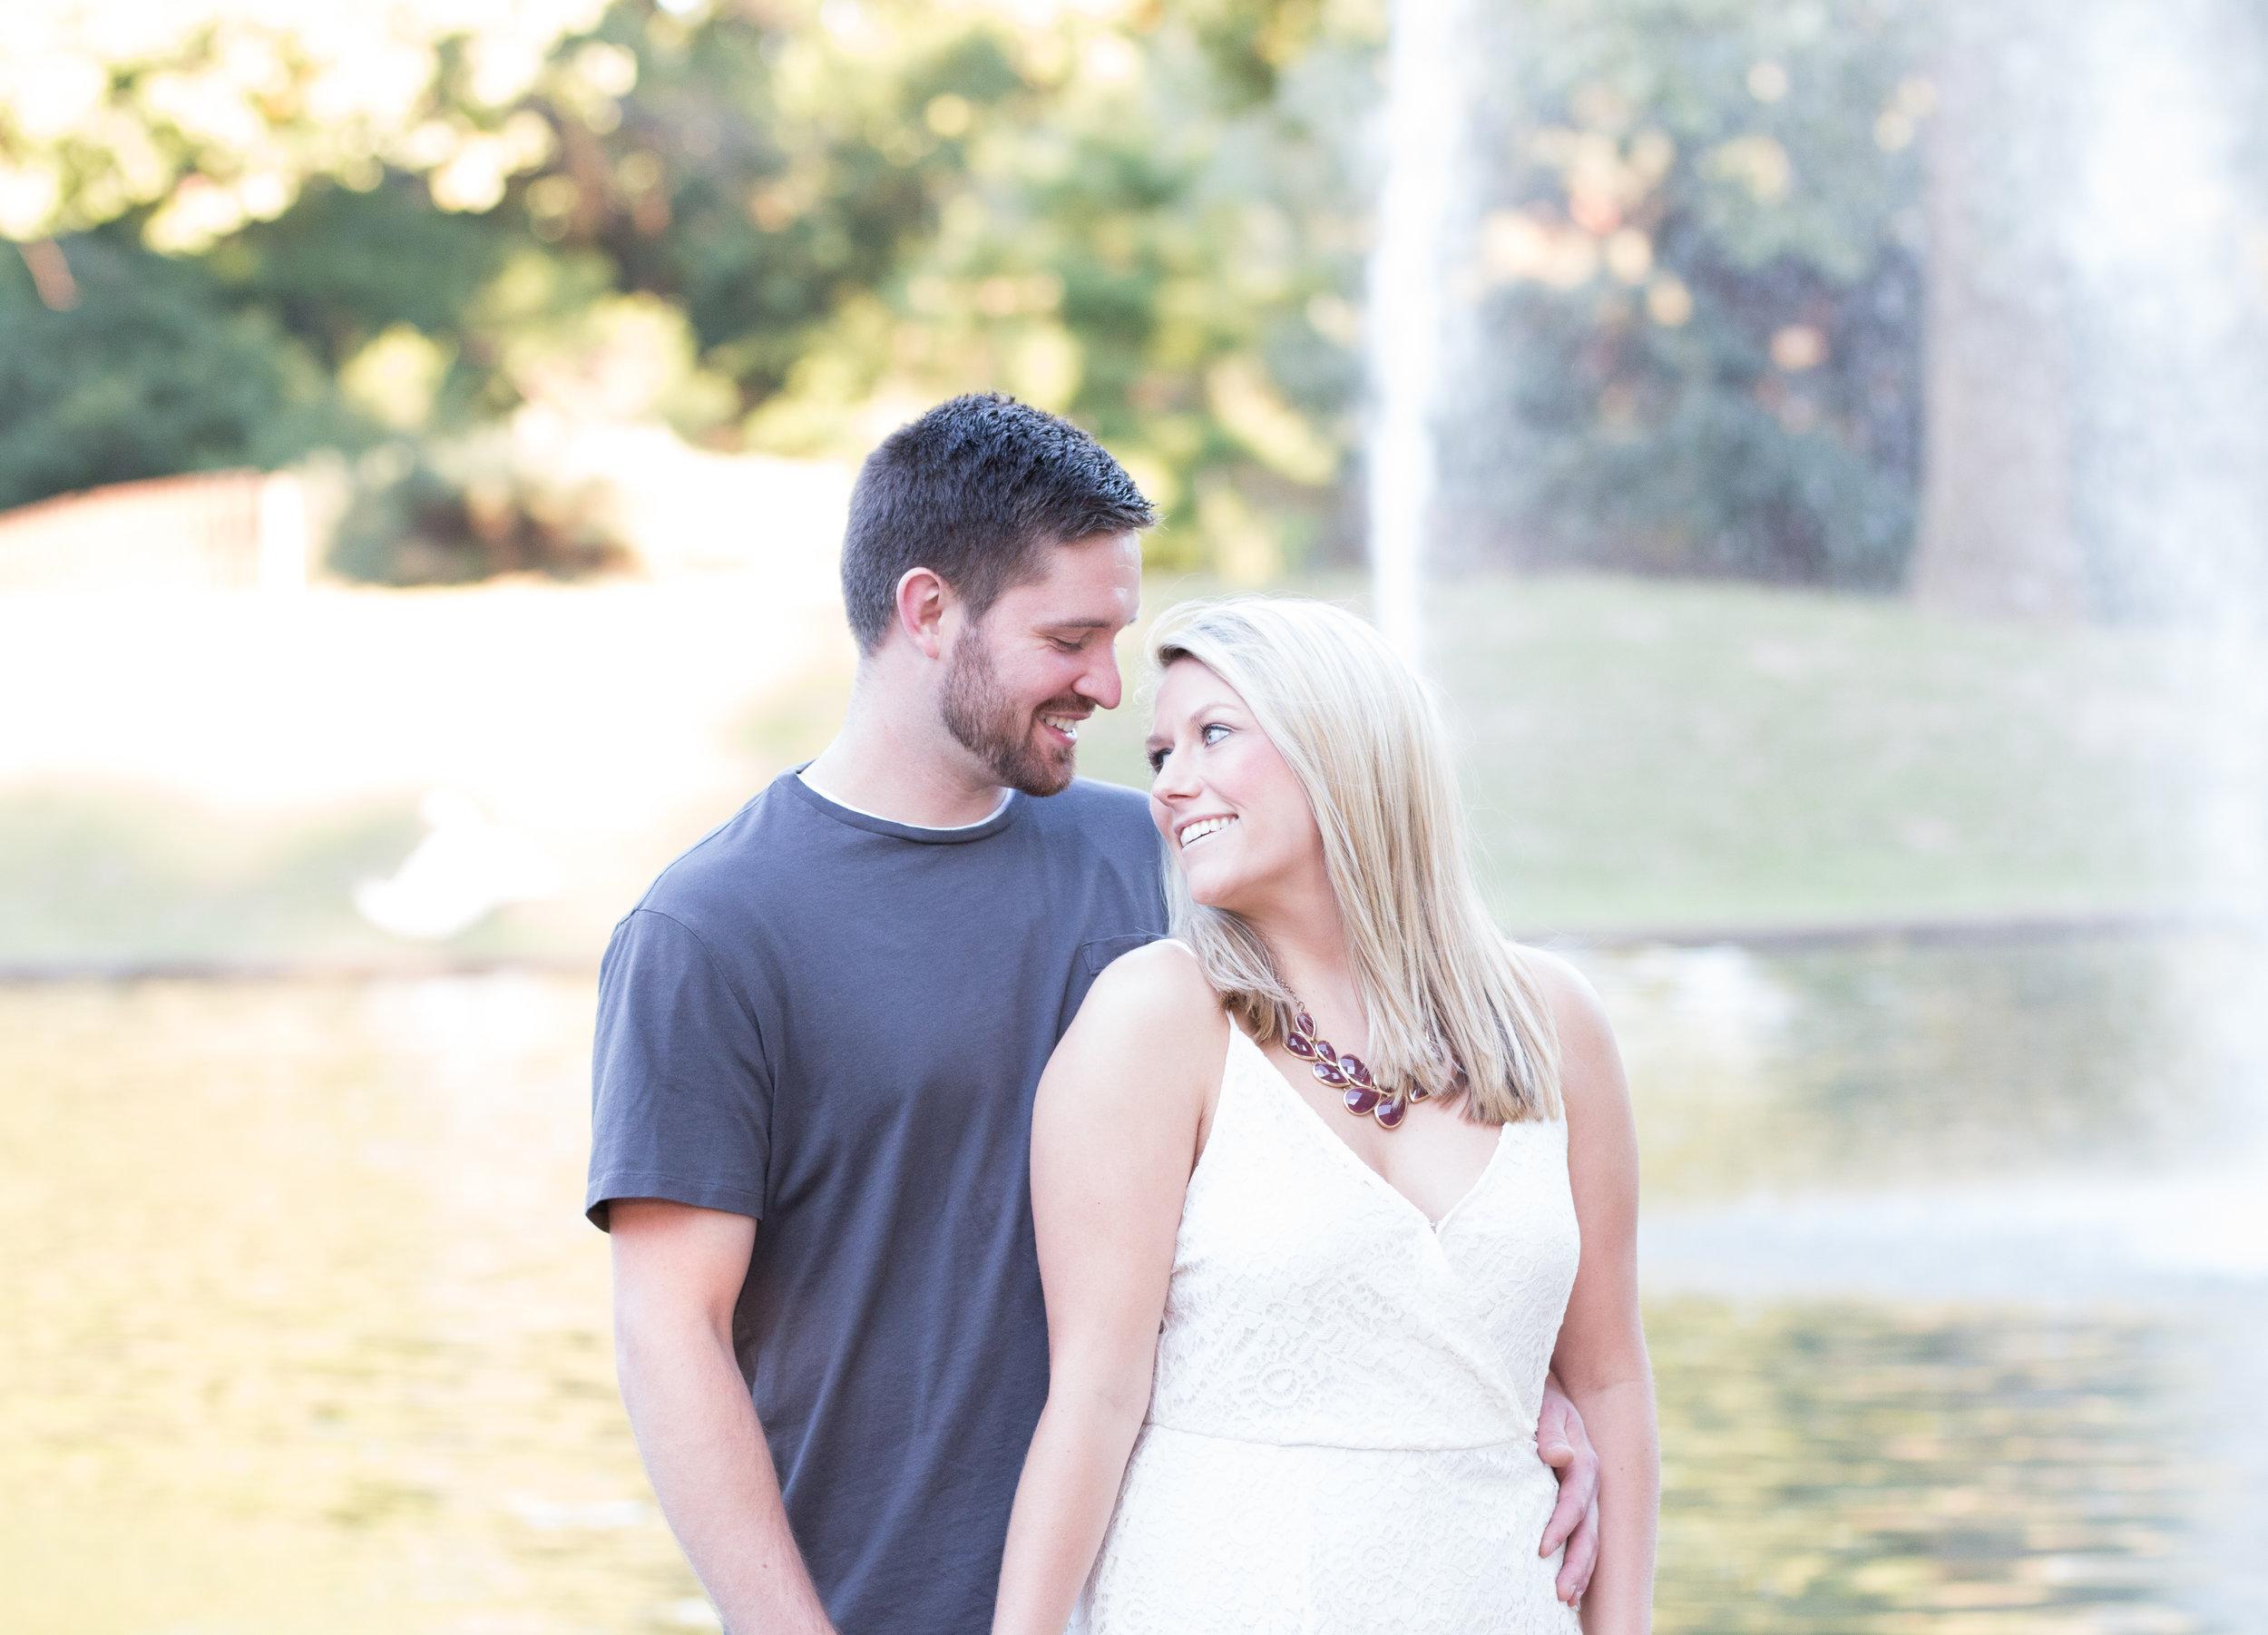 Kurtis & Jessica_Engagement_851 - 20170624-24.jpg